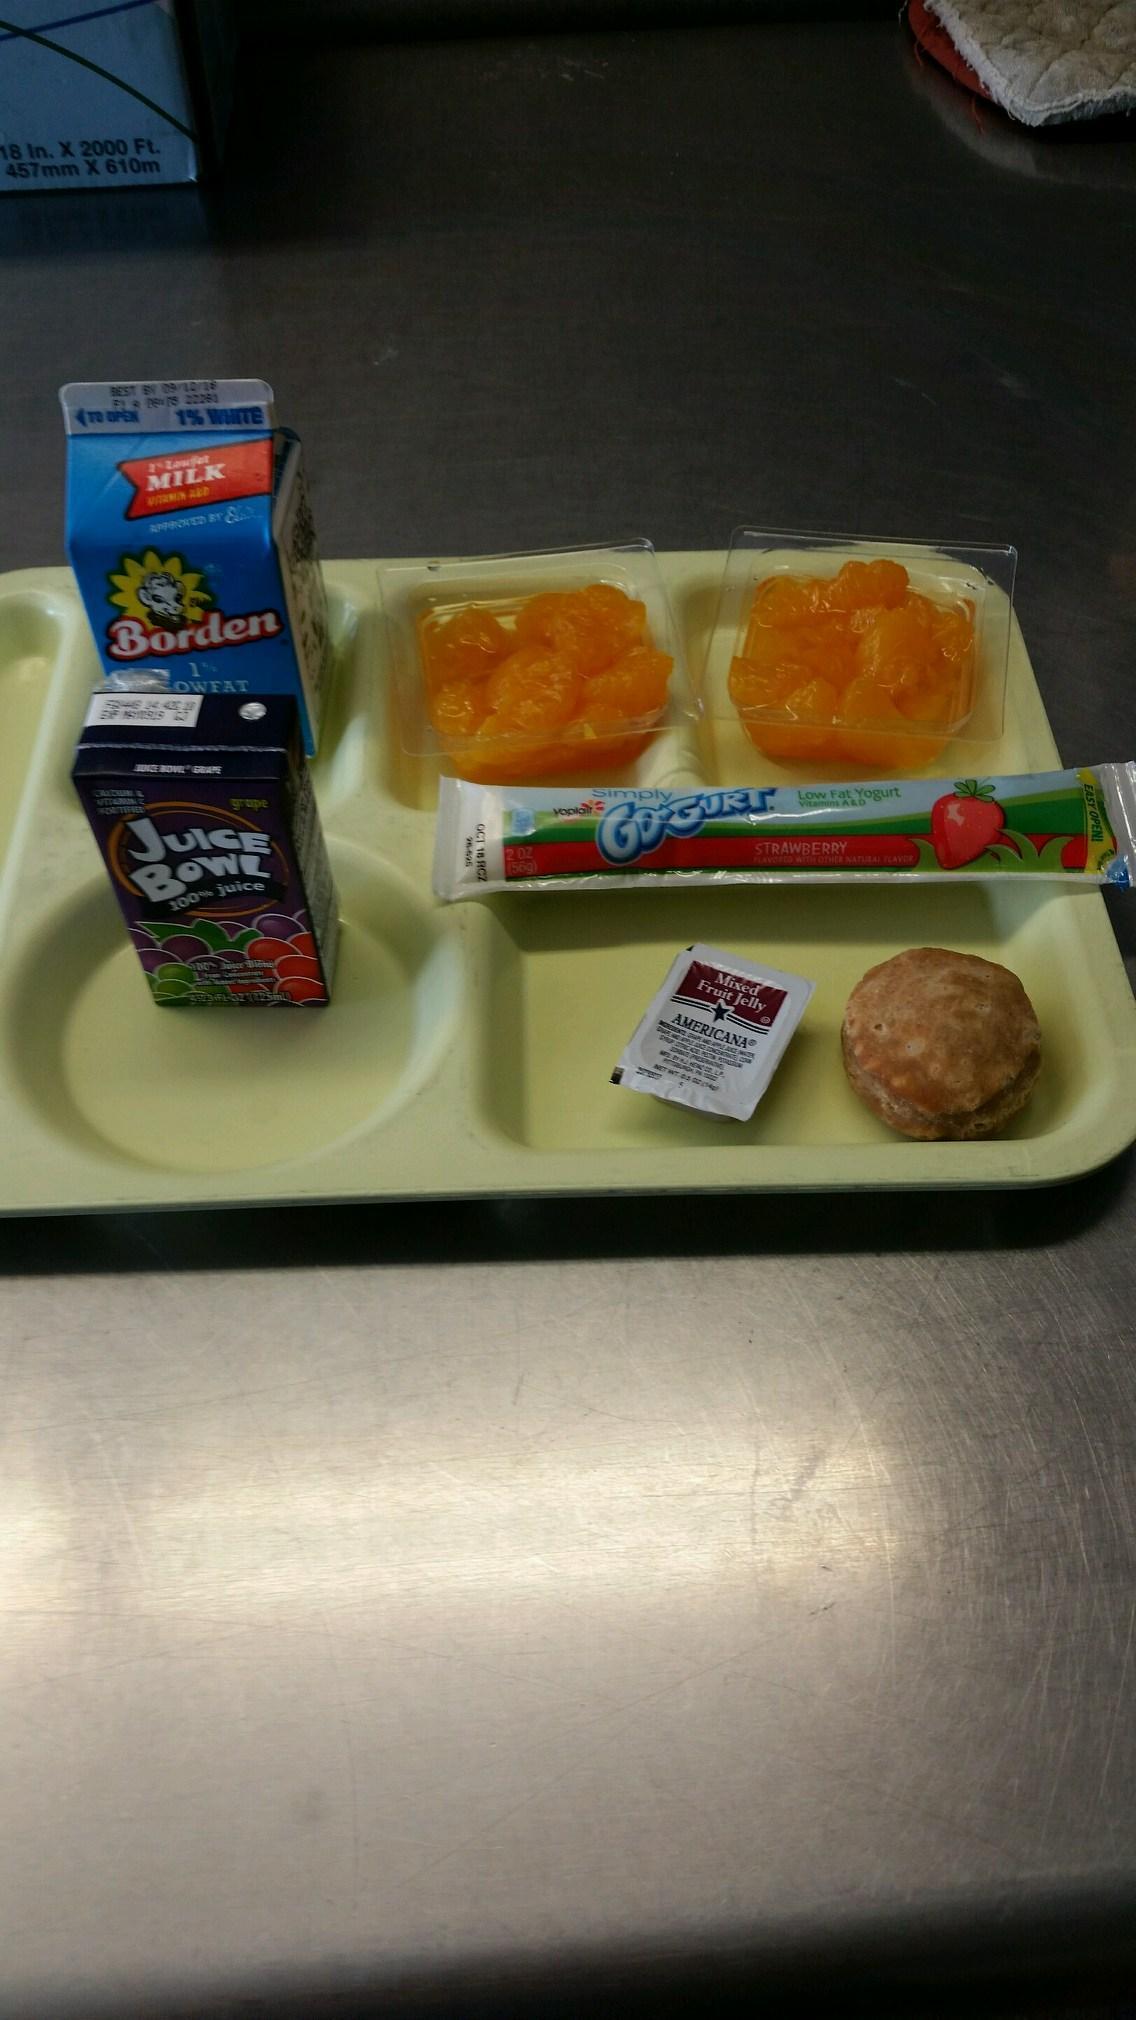 mini biscuit and gogurt